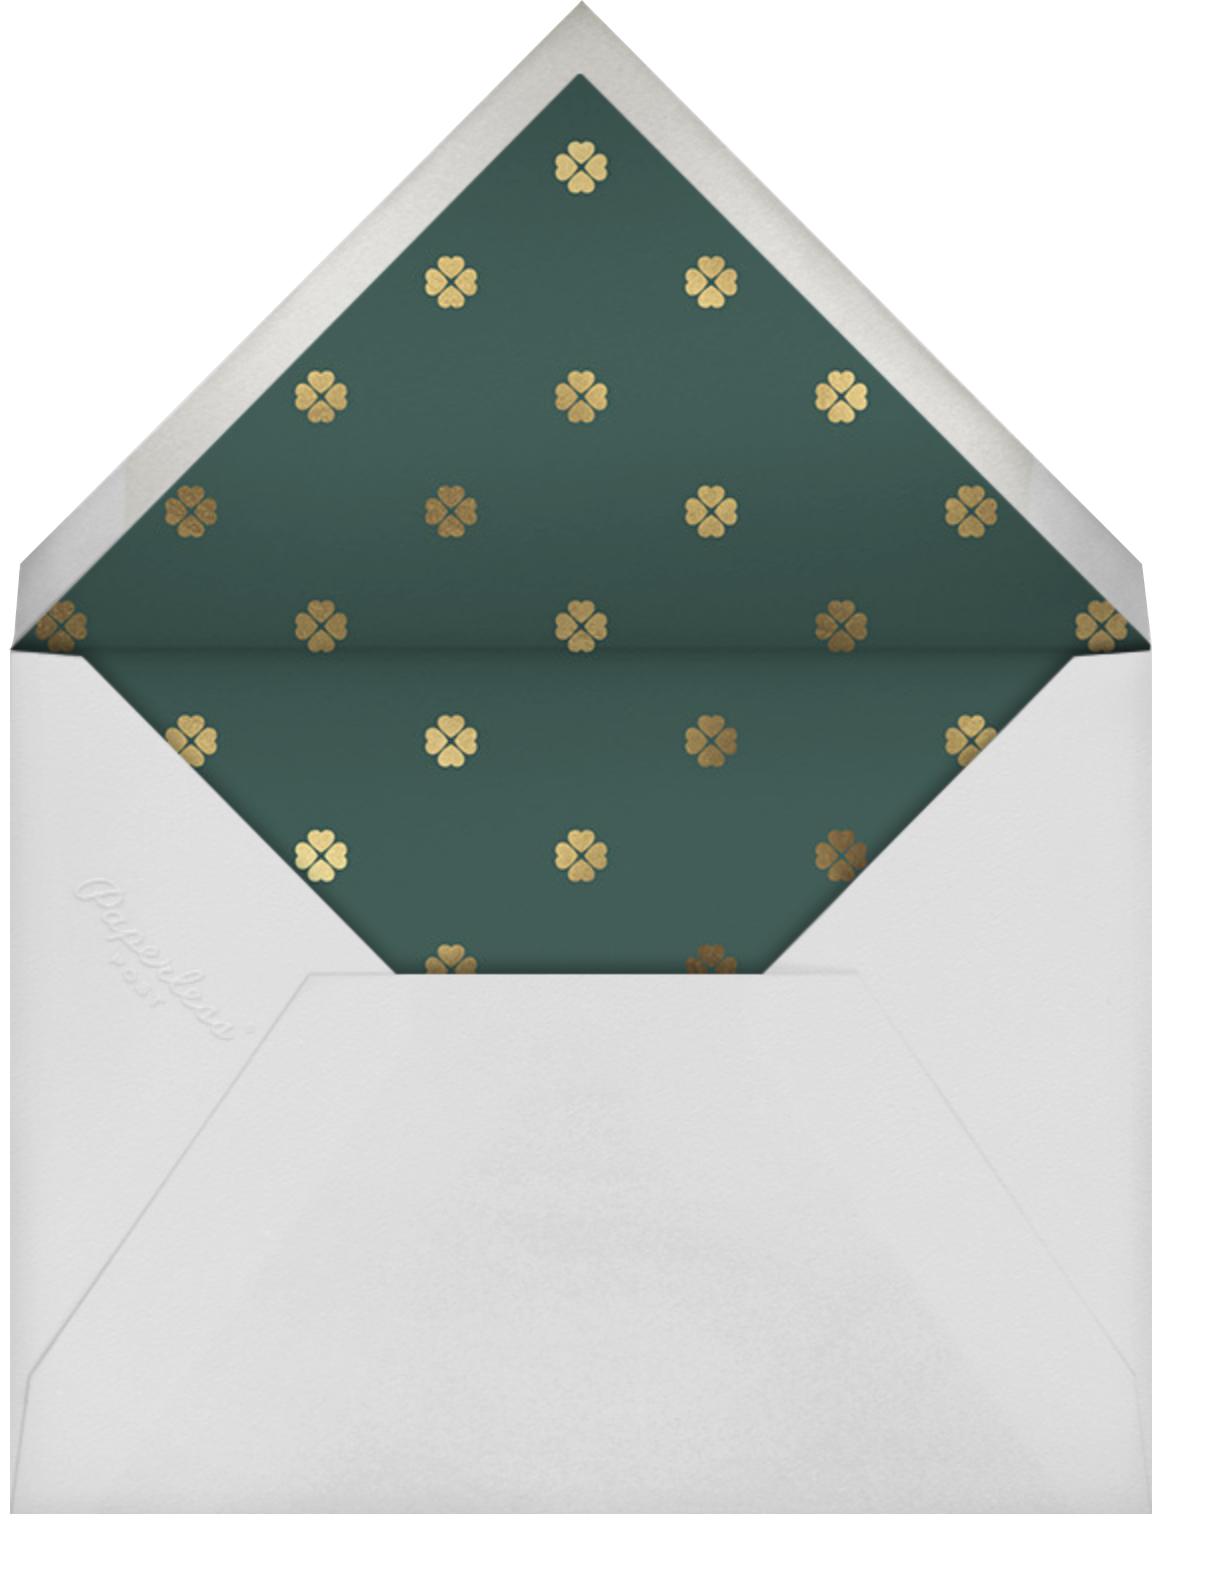 Three Petals - Mint - kate spade new york - Bridal shower - envelope back